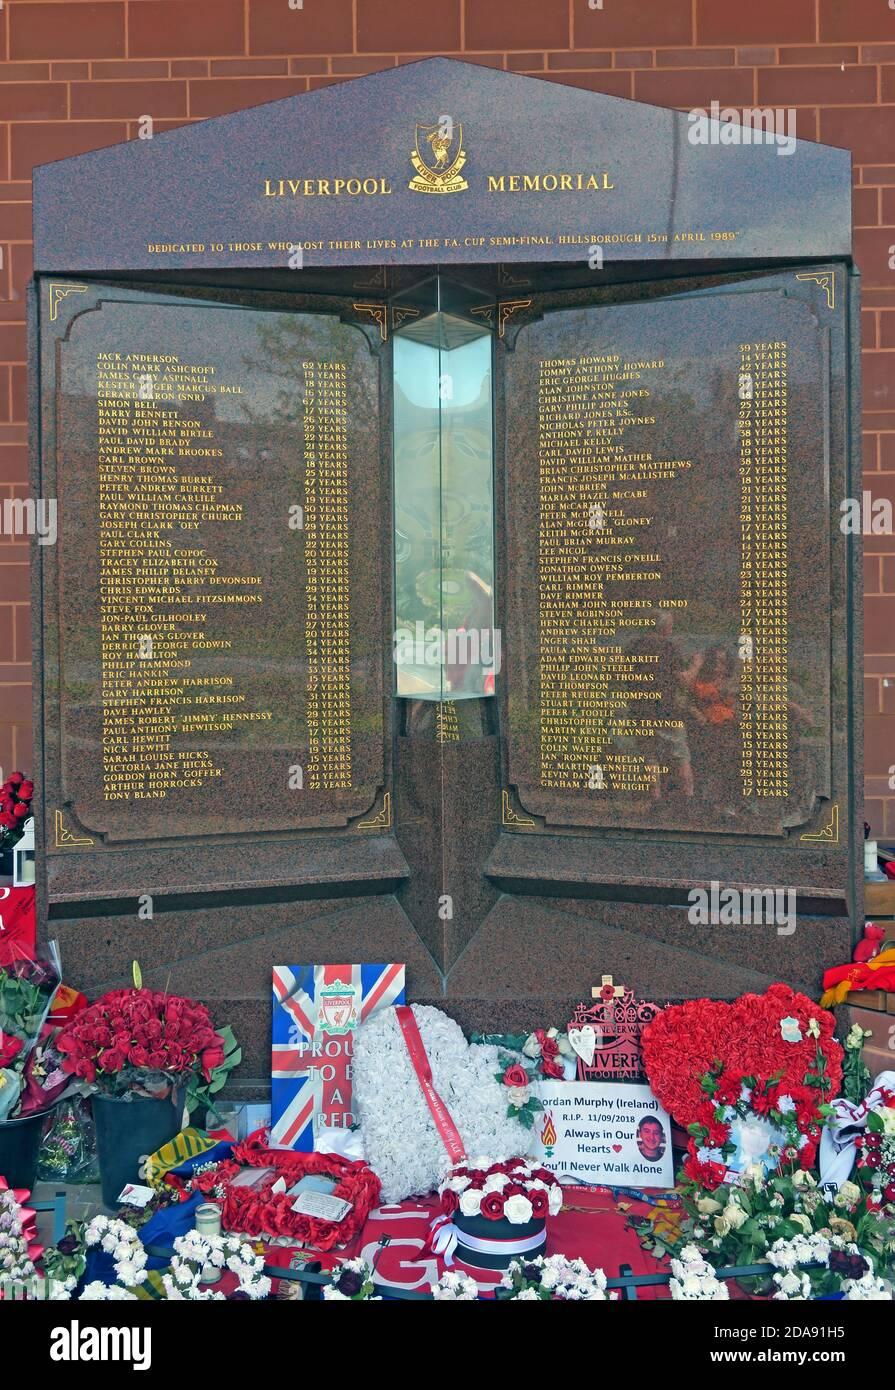 GoTonySmith,HotpixUK,@HotpixUK,red,Liverpool FC,Liverpool Football Club,FC,disaster,memorial,Justice For The 96,Hillsbough,Merseyside,England,UK,names,dead,fans,Hillsborough Stadium,Sheffield,premier league,flowers